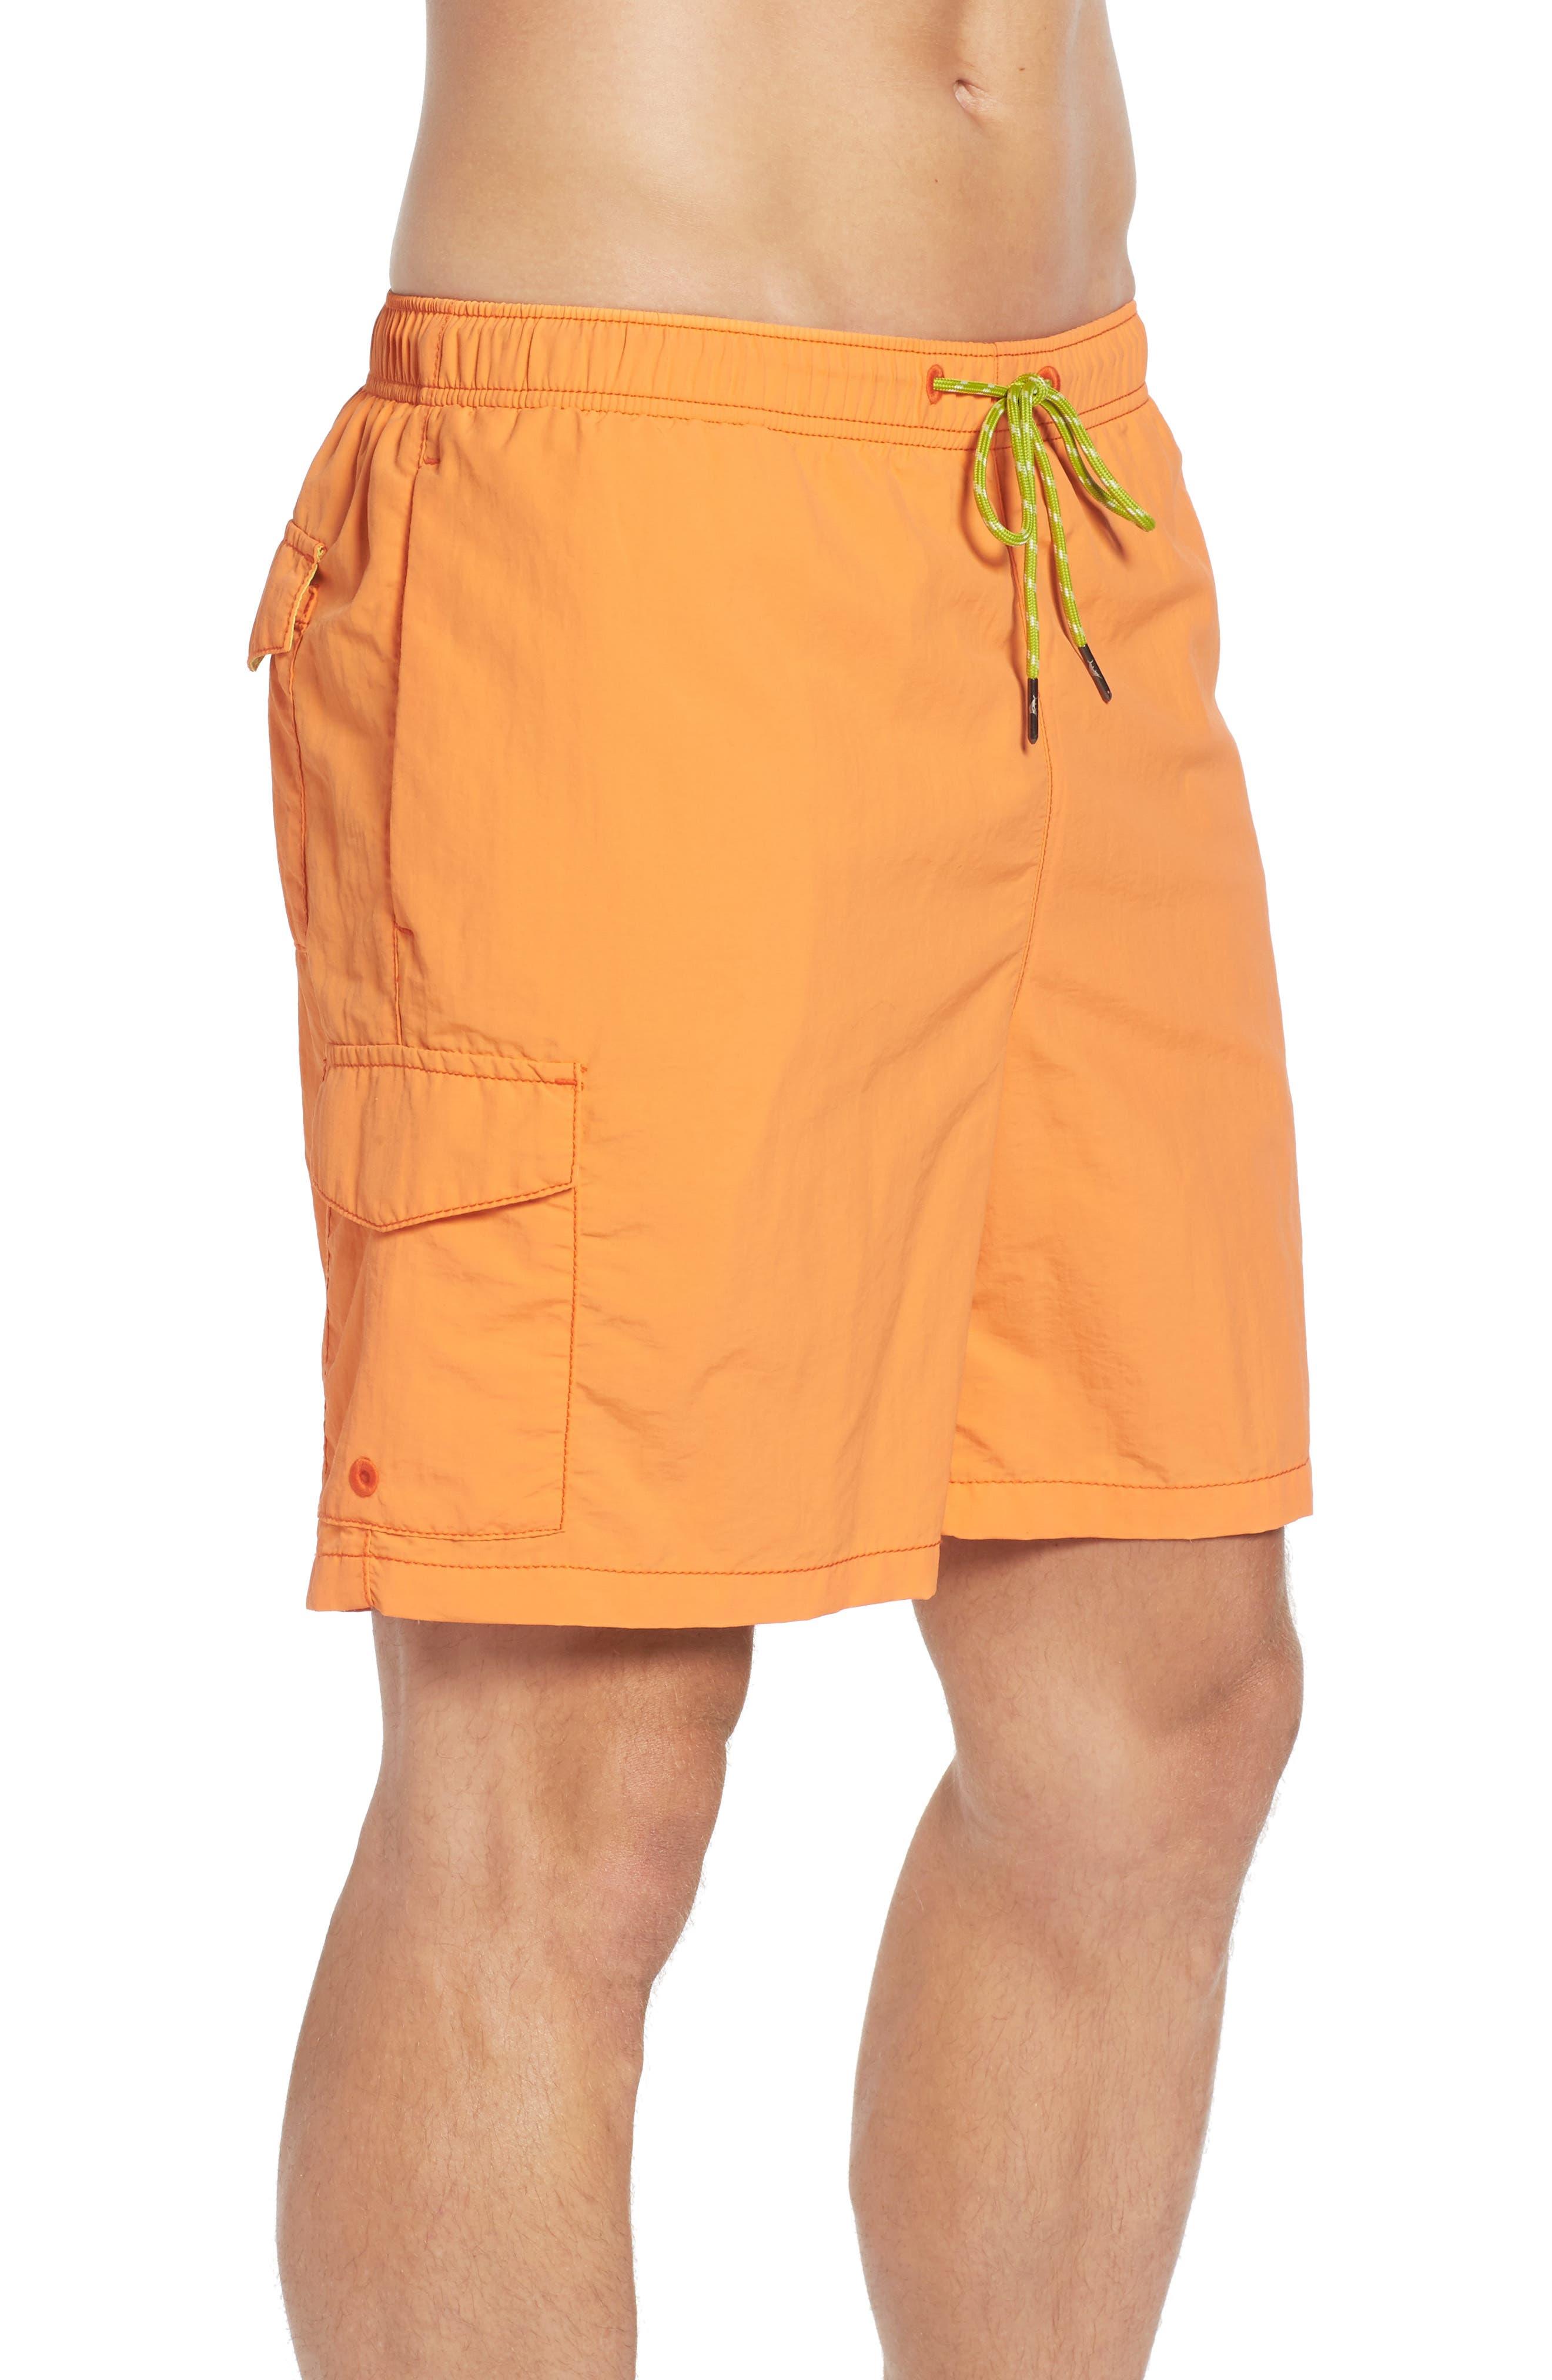 Alternate Image 4  - Tommy Bahama Naples Happy Go Cargo Swim Trunks